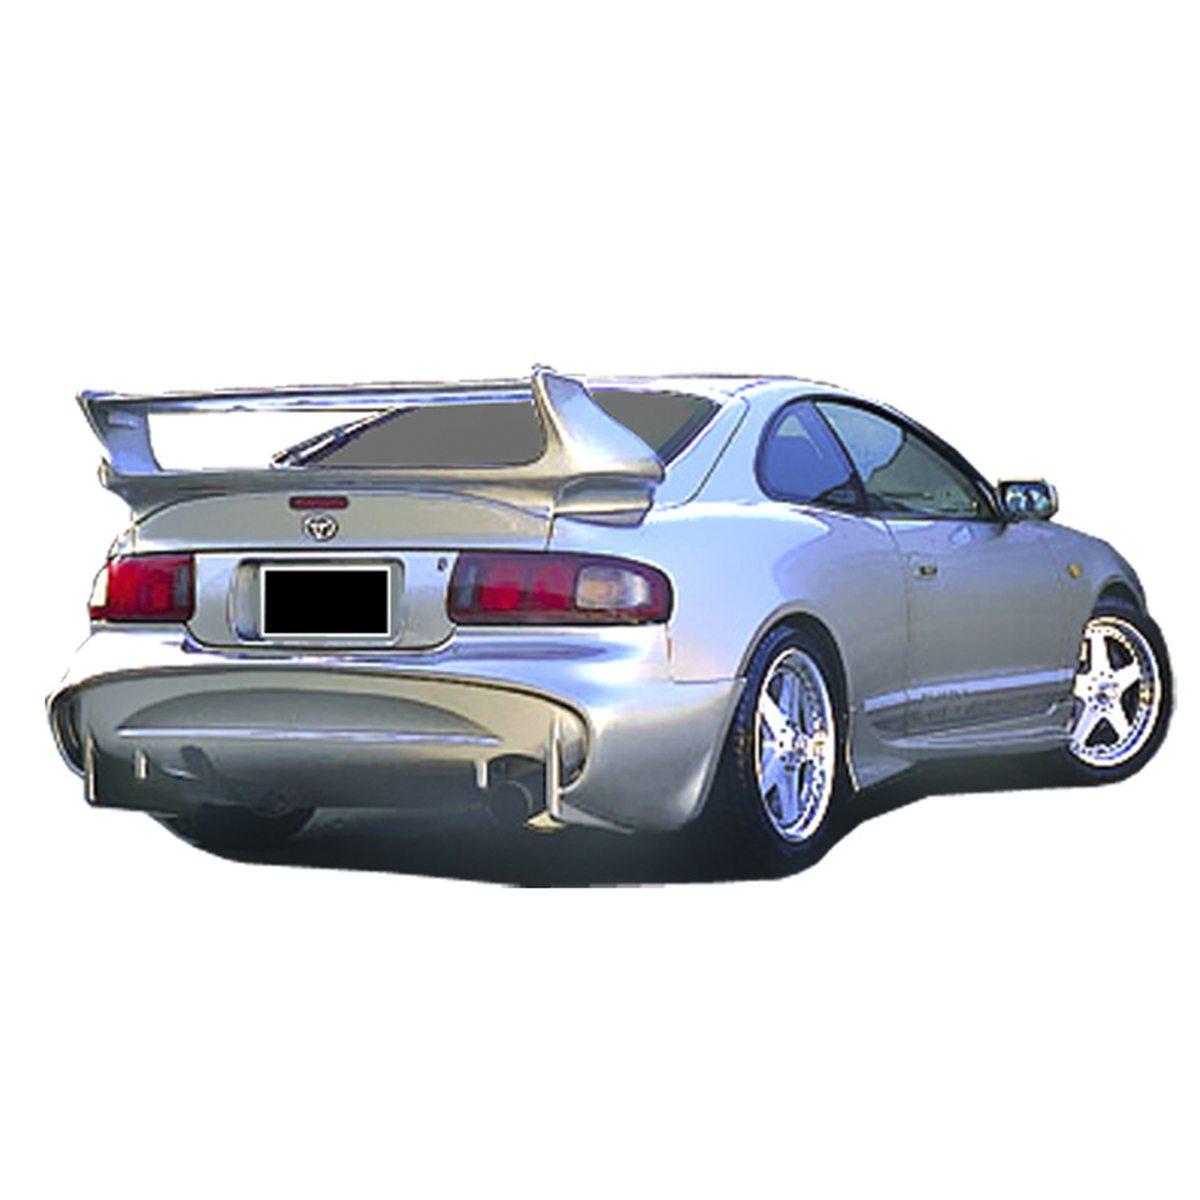 Toyota-Celica-94-T20-Tras-PCA132